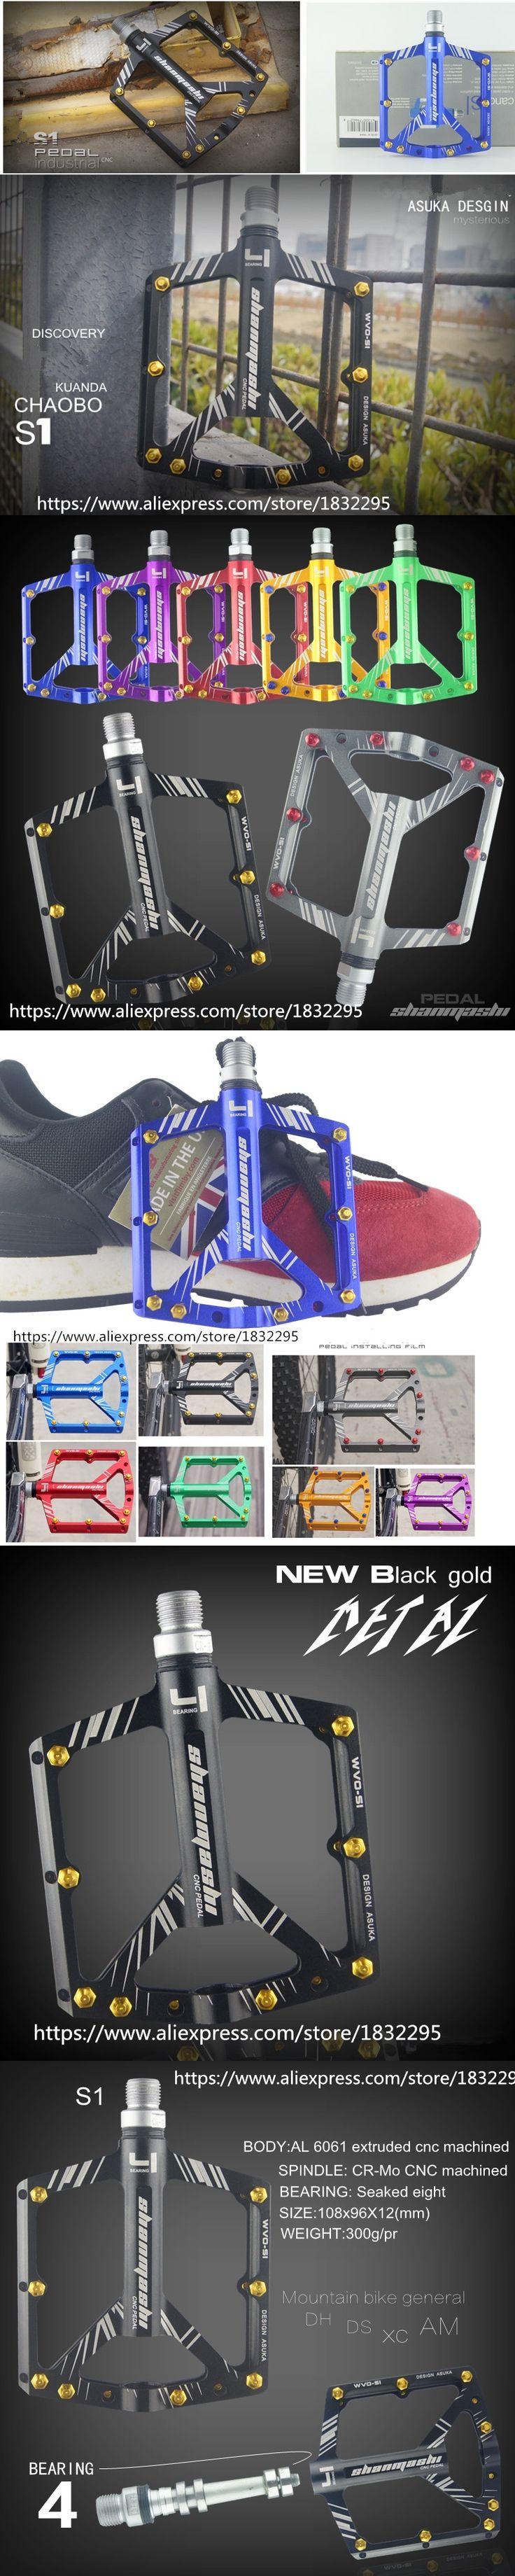 1 pair Cycling 7 Colors Aviation Aluminum Alloy Road Bike Pedals Ultralight MTB BMX DU Bearing Bicycle Pedal Bike Parts